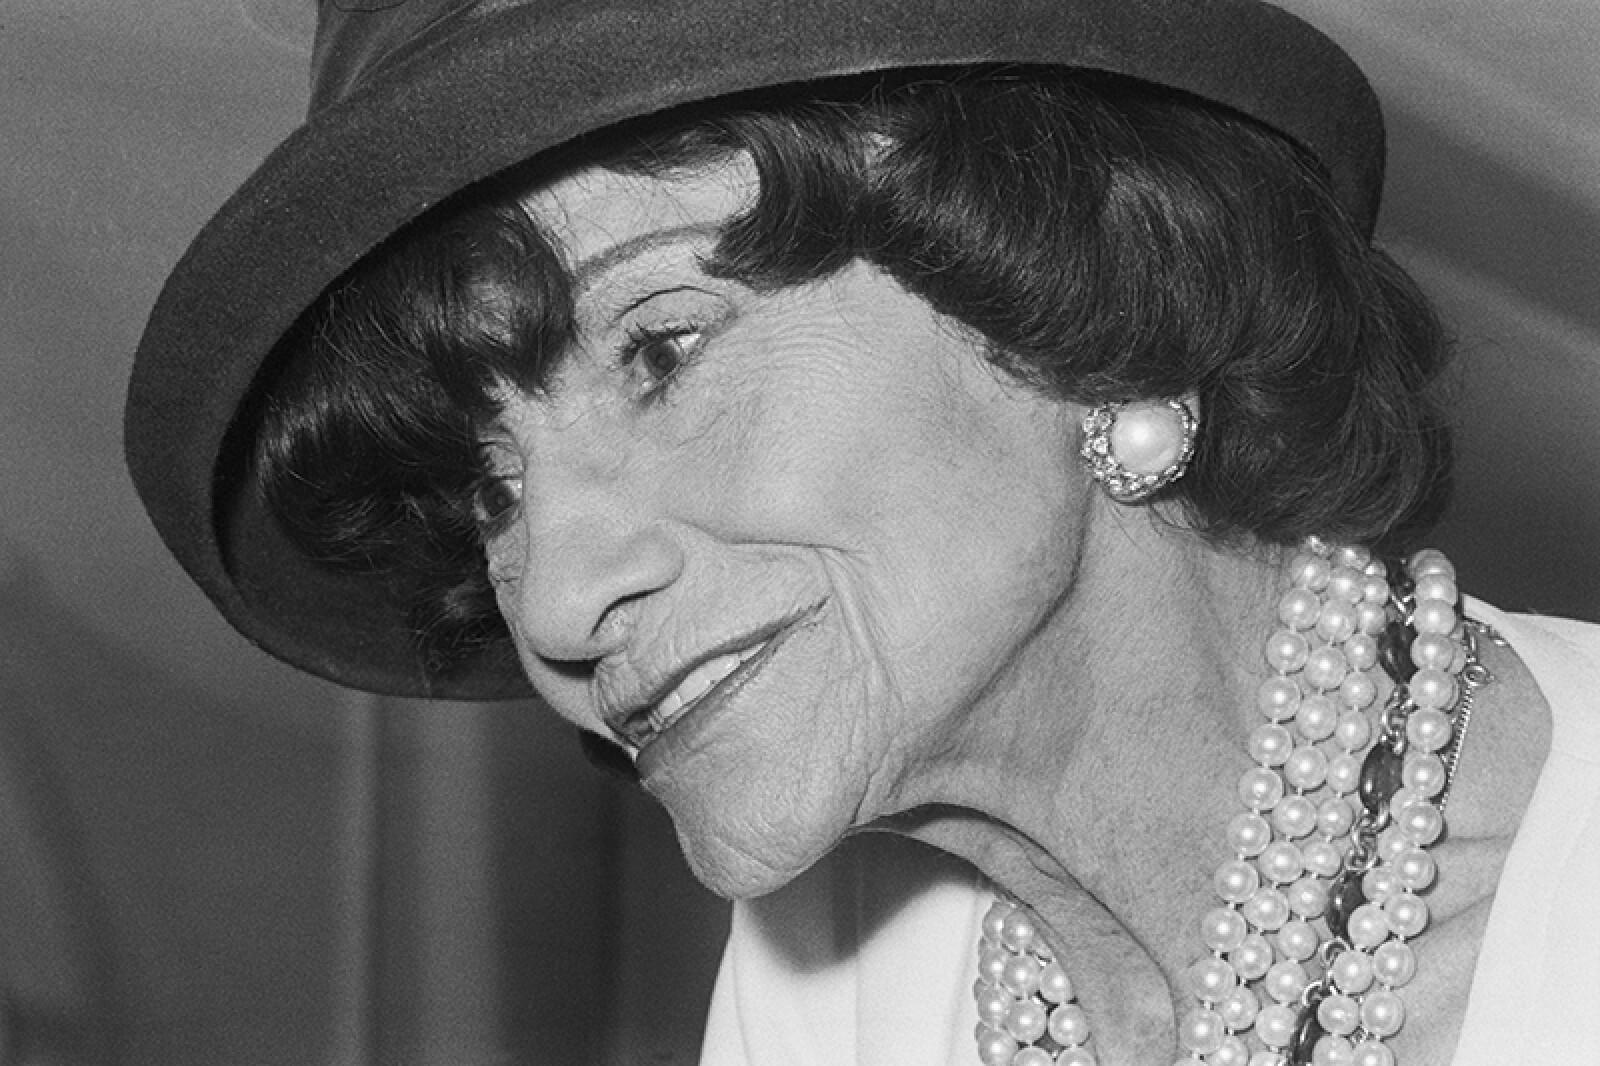 French Fashion Designer Coco Chanel